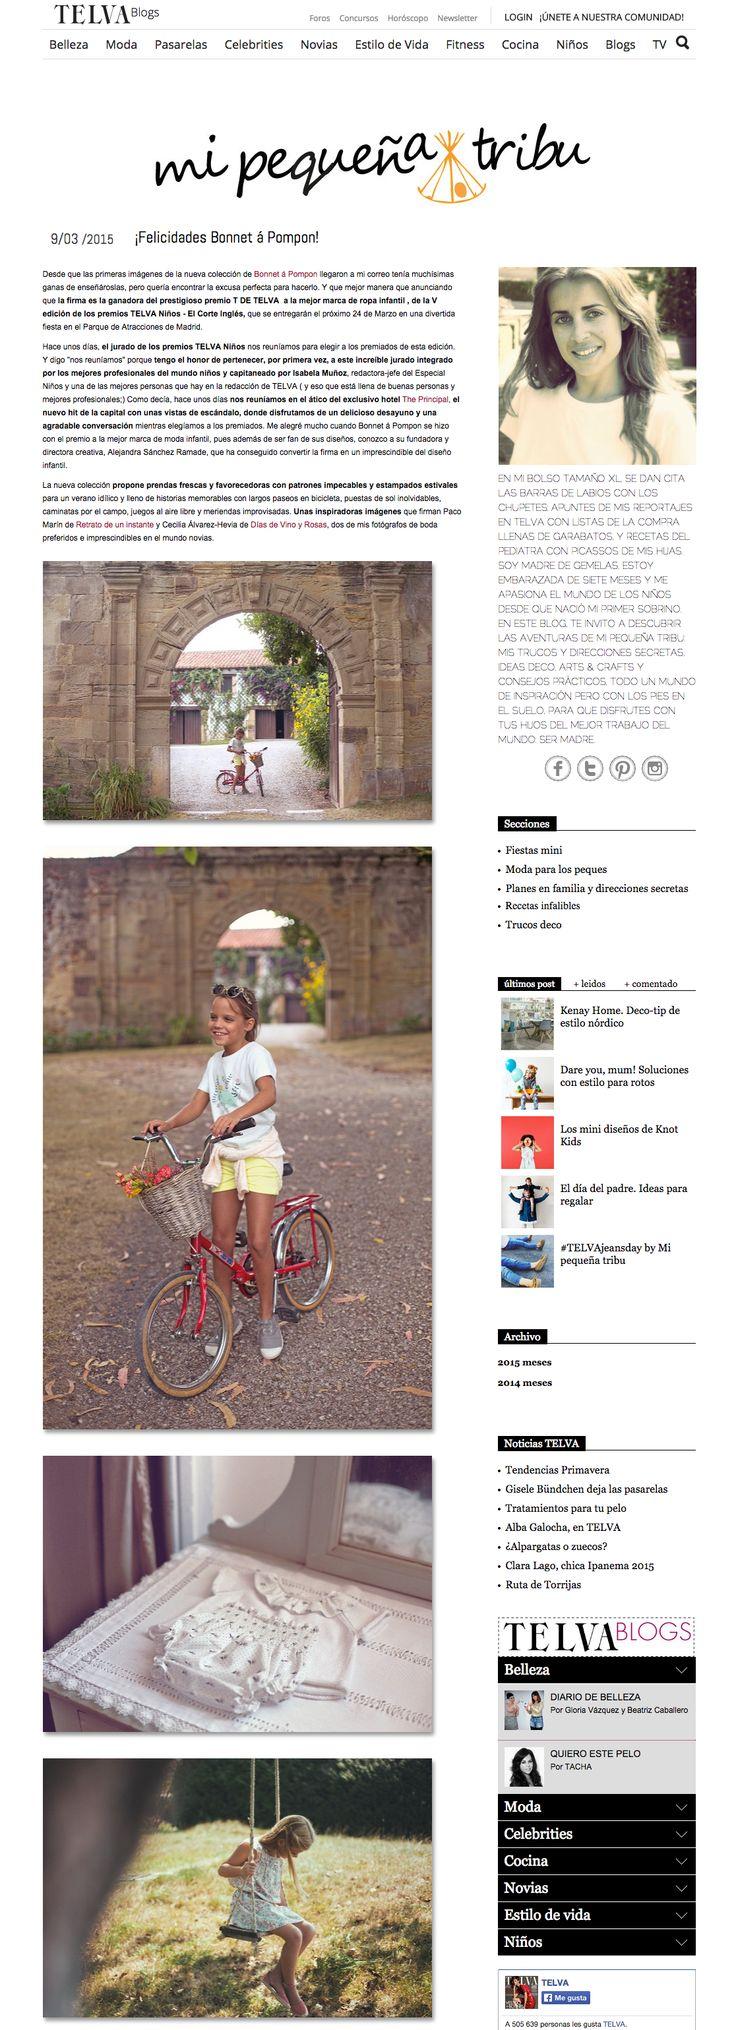 "Featured in Telva's blog ""Mi pequeña tribu"" together with Retrato de un Instante || http://www.telva.com/blogs/mi-pequena-tribu/2015/03/09/felicidades-bonnet-a-pompon.html"